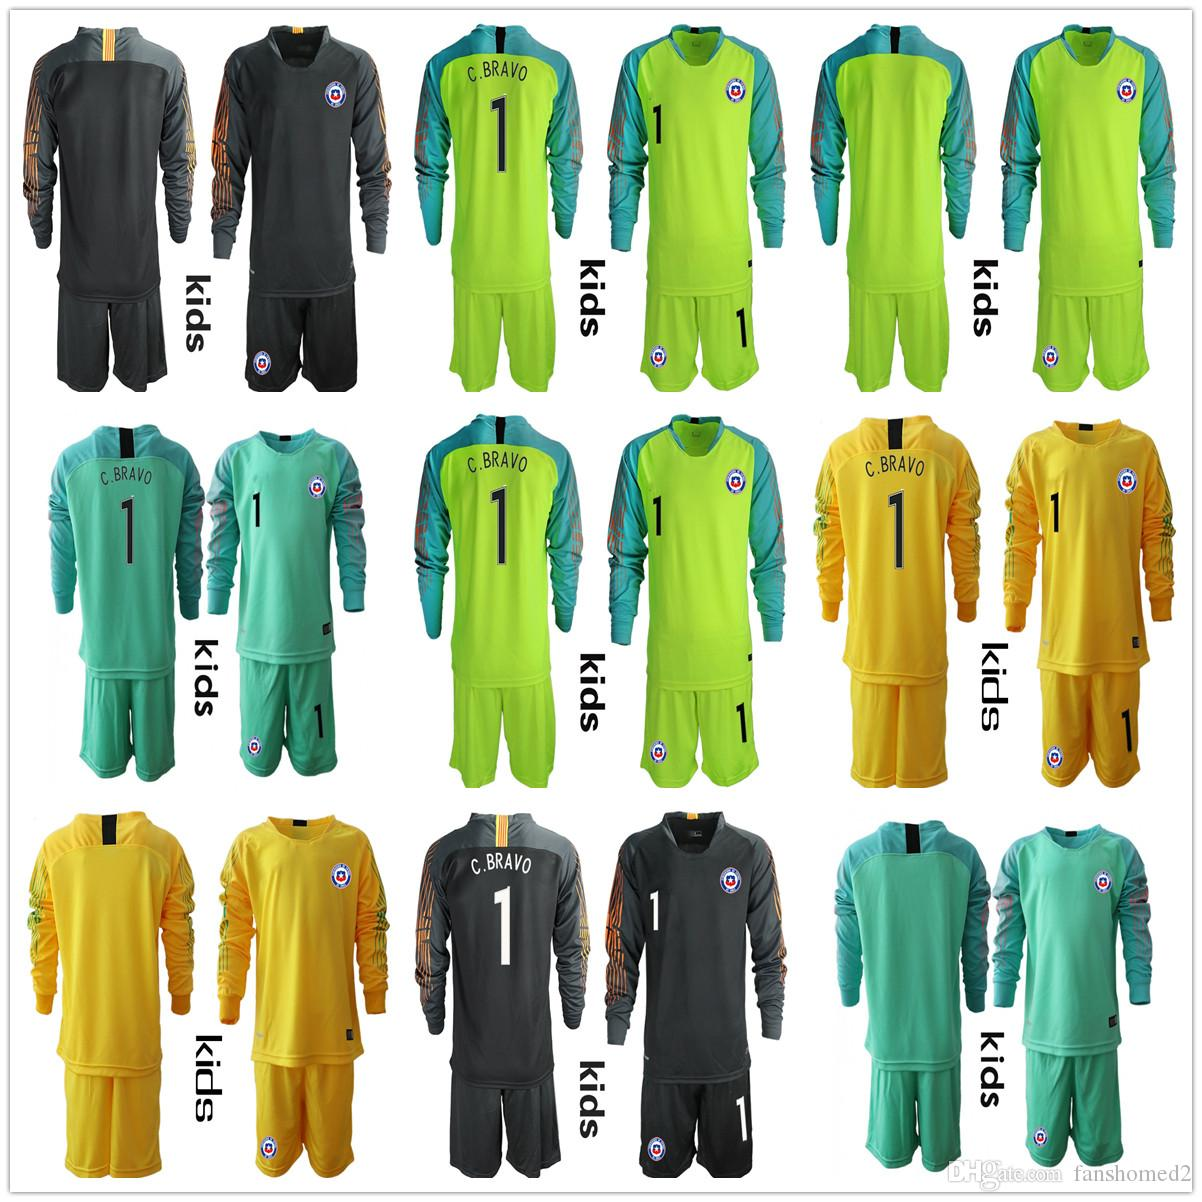 2019 Long Sleeve Youth 2018 2019 Kids Boys Soccer Jerseys  1 C. BRAVO Chile  Goalkeeper National Team GK Jerseys Kid Football VALDIVIA Kid Uniform From  ... 24208c9ac